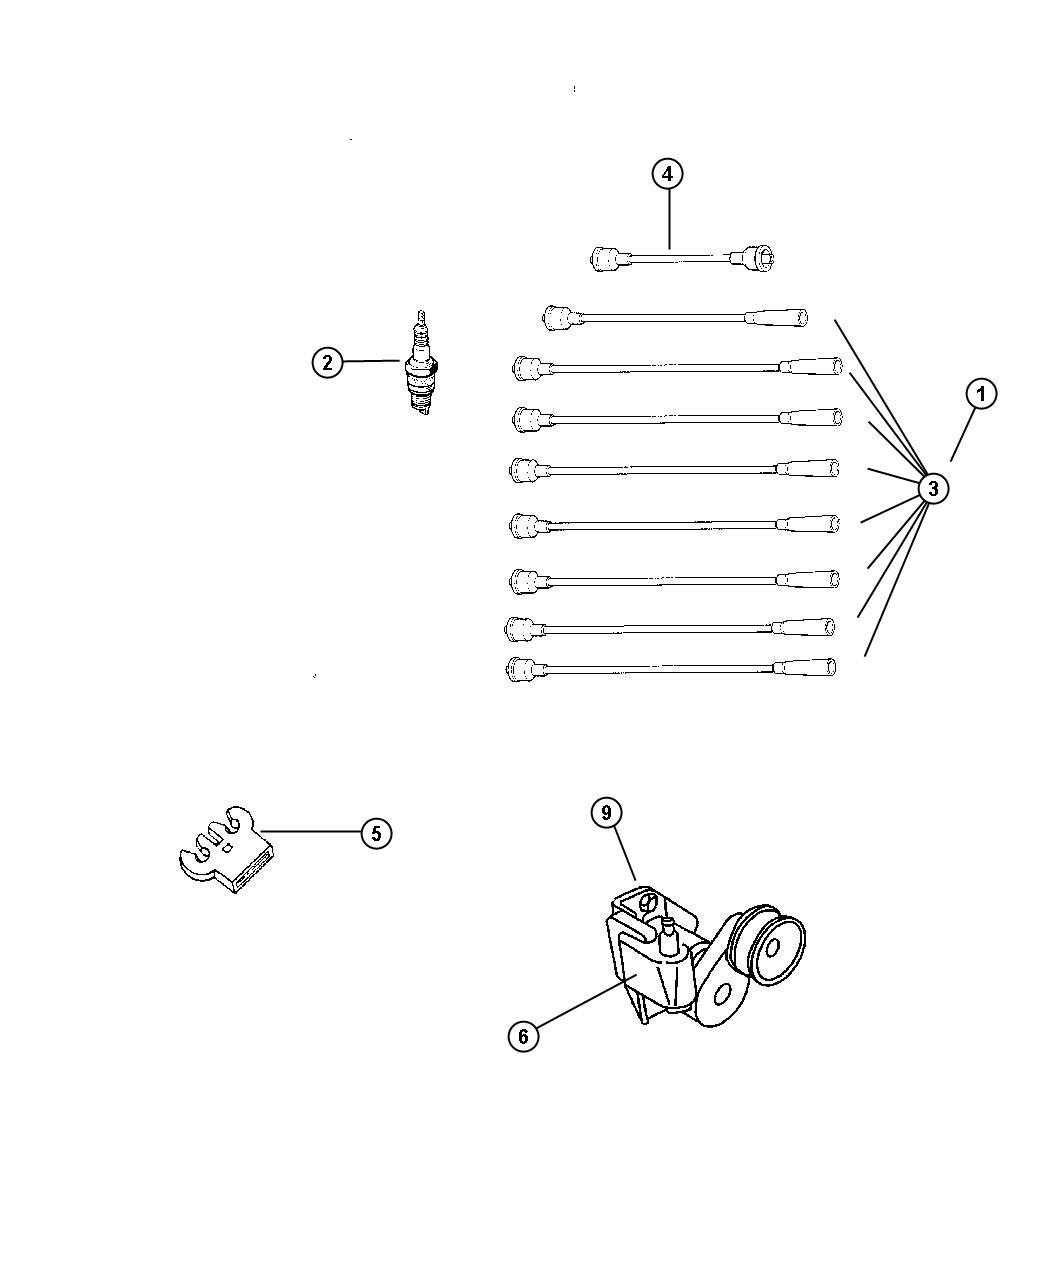 2012 Dodge Challenger Spark plug. Plugs, engine, ignition